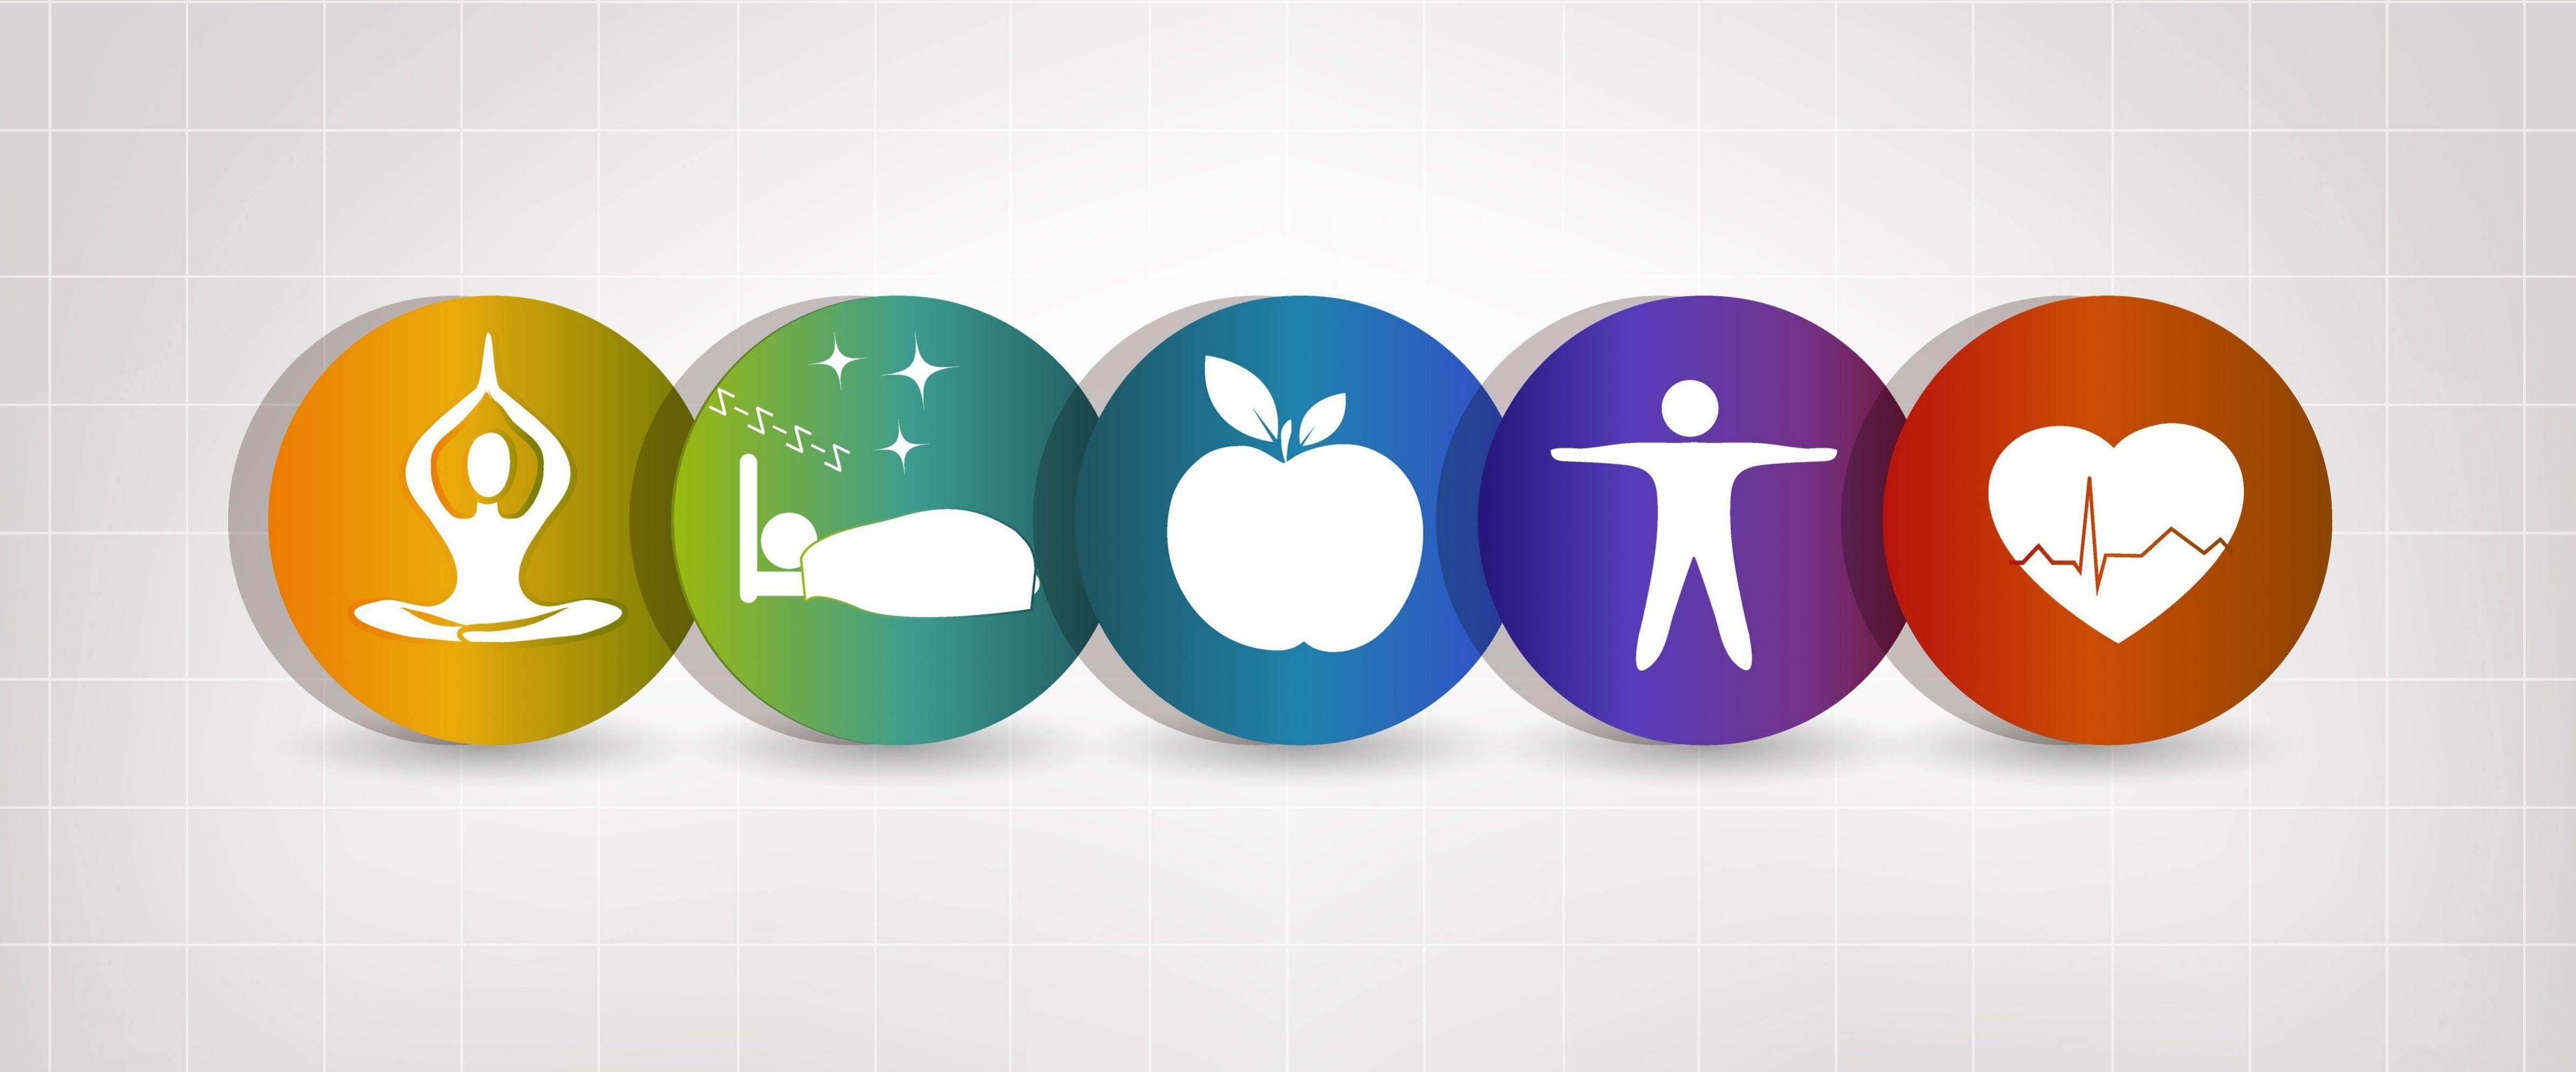 healthy-living-icons-2.jpg